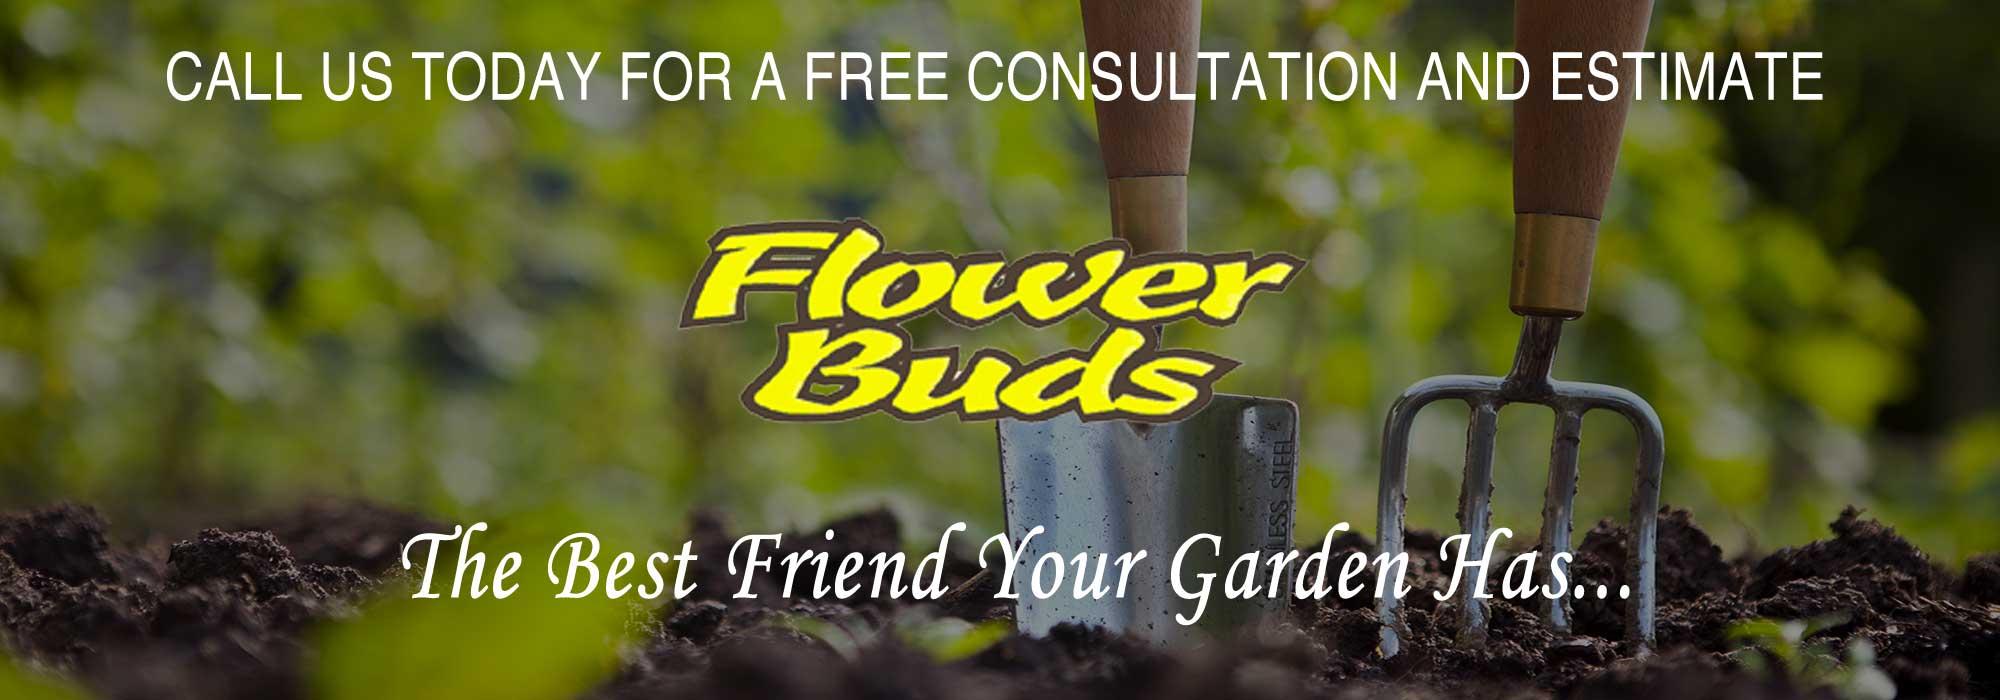 Flower Buds Professional Gardening